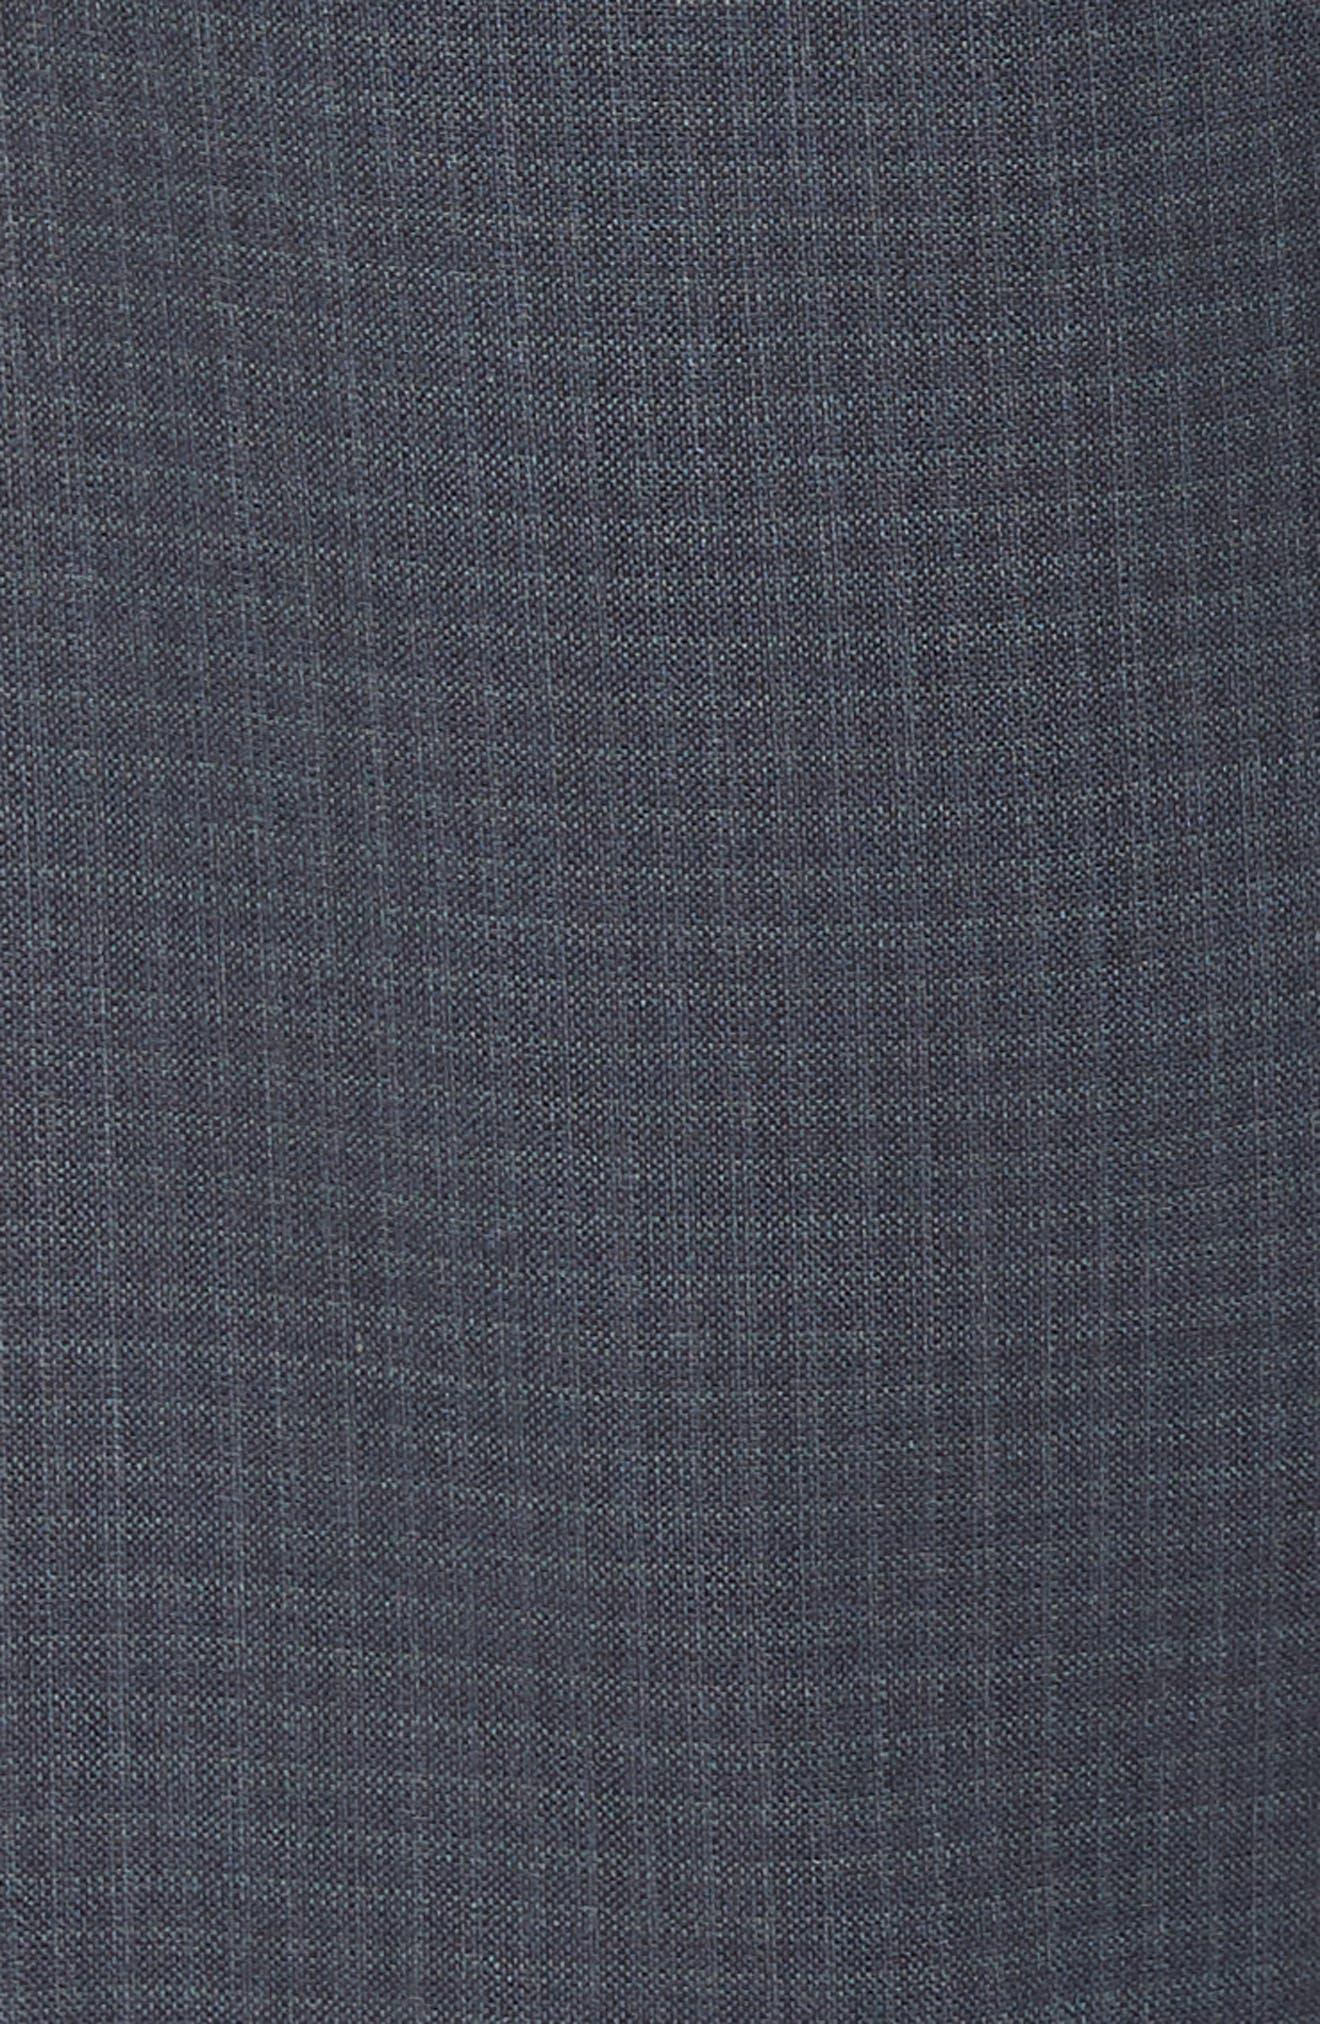 Tech-Smart Check Flat Front Stretch Wool Pants,                             Alternate thumbnail 2, color,                             030